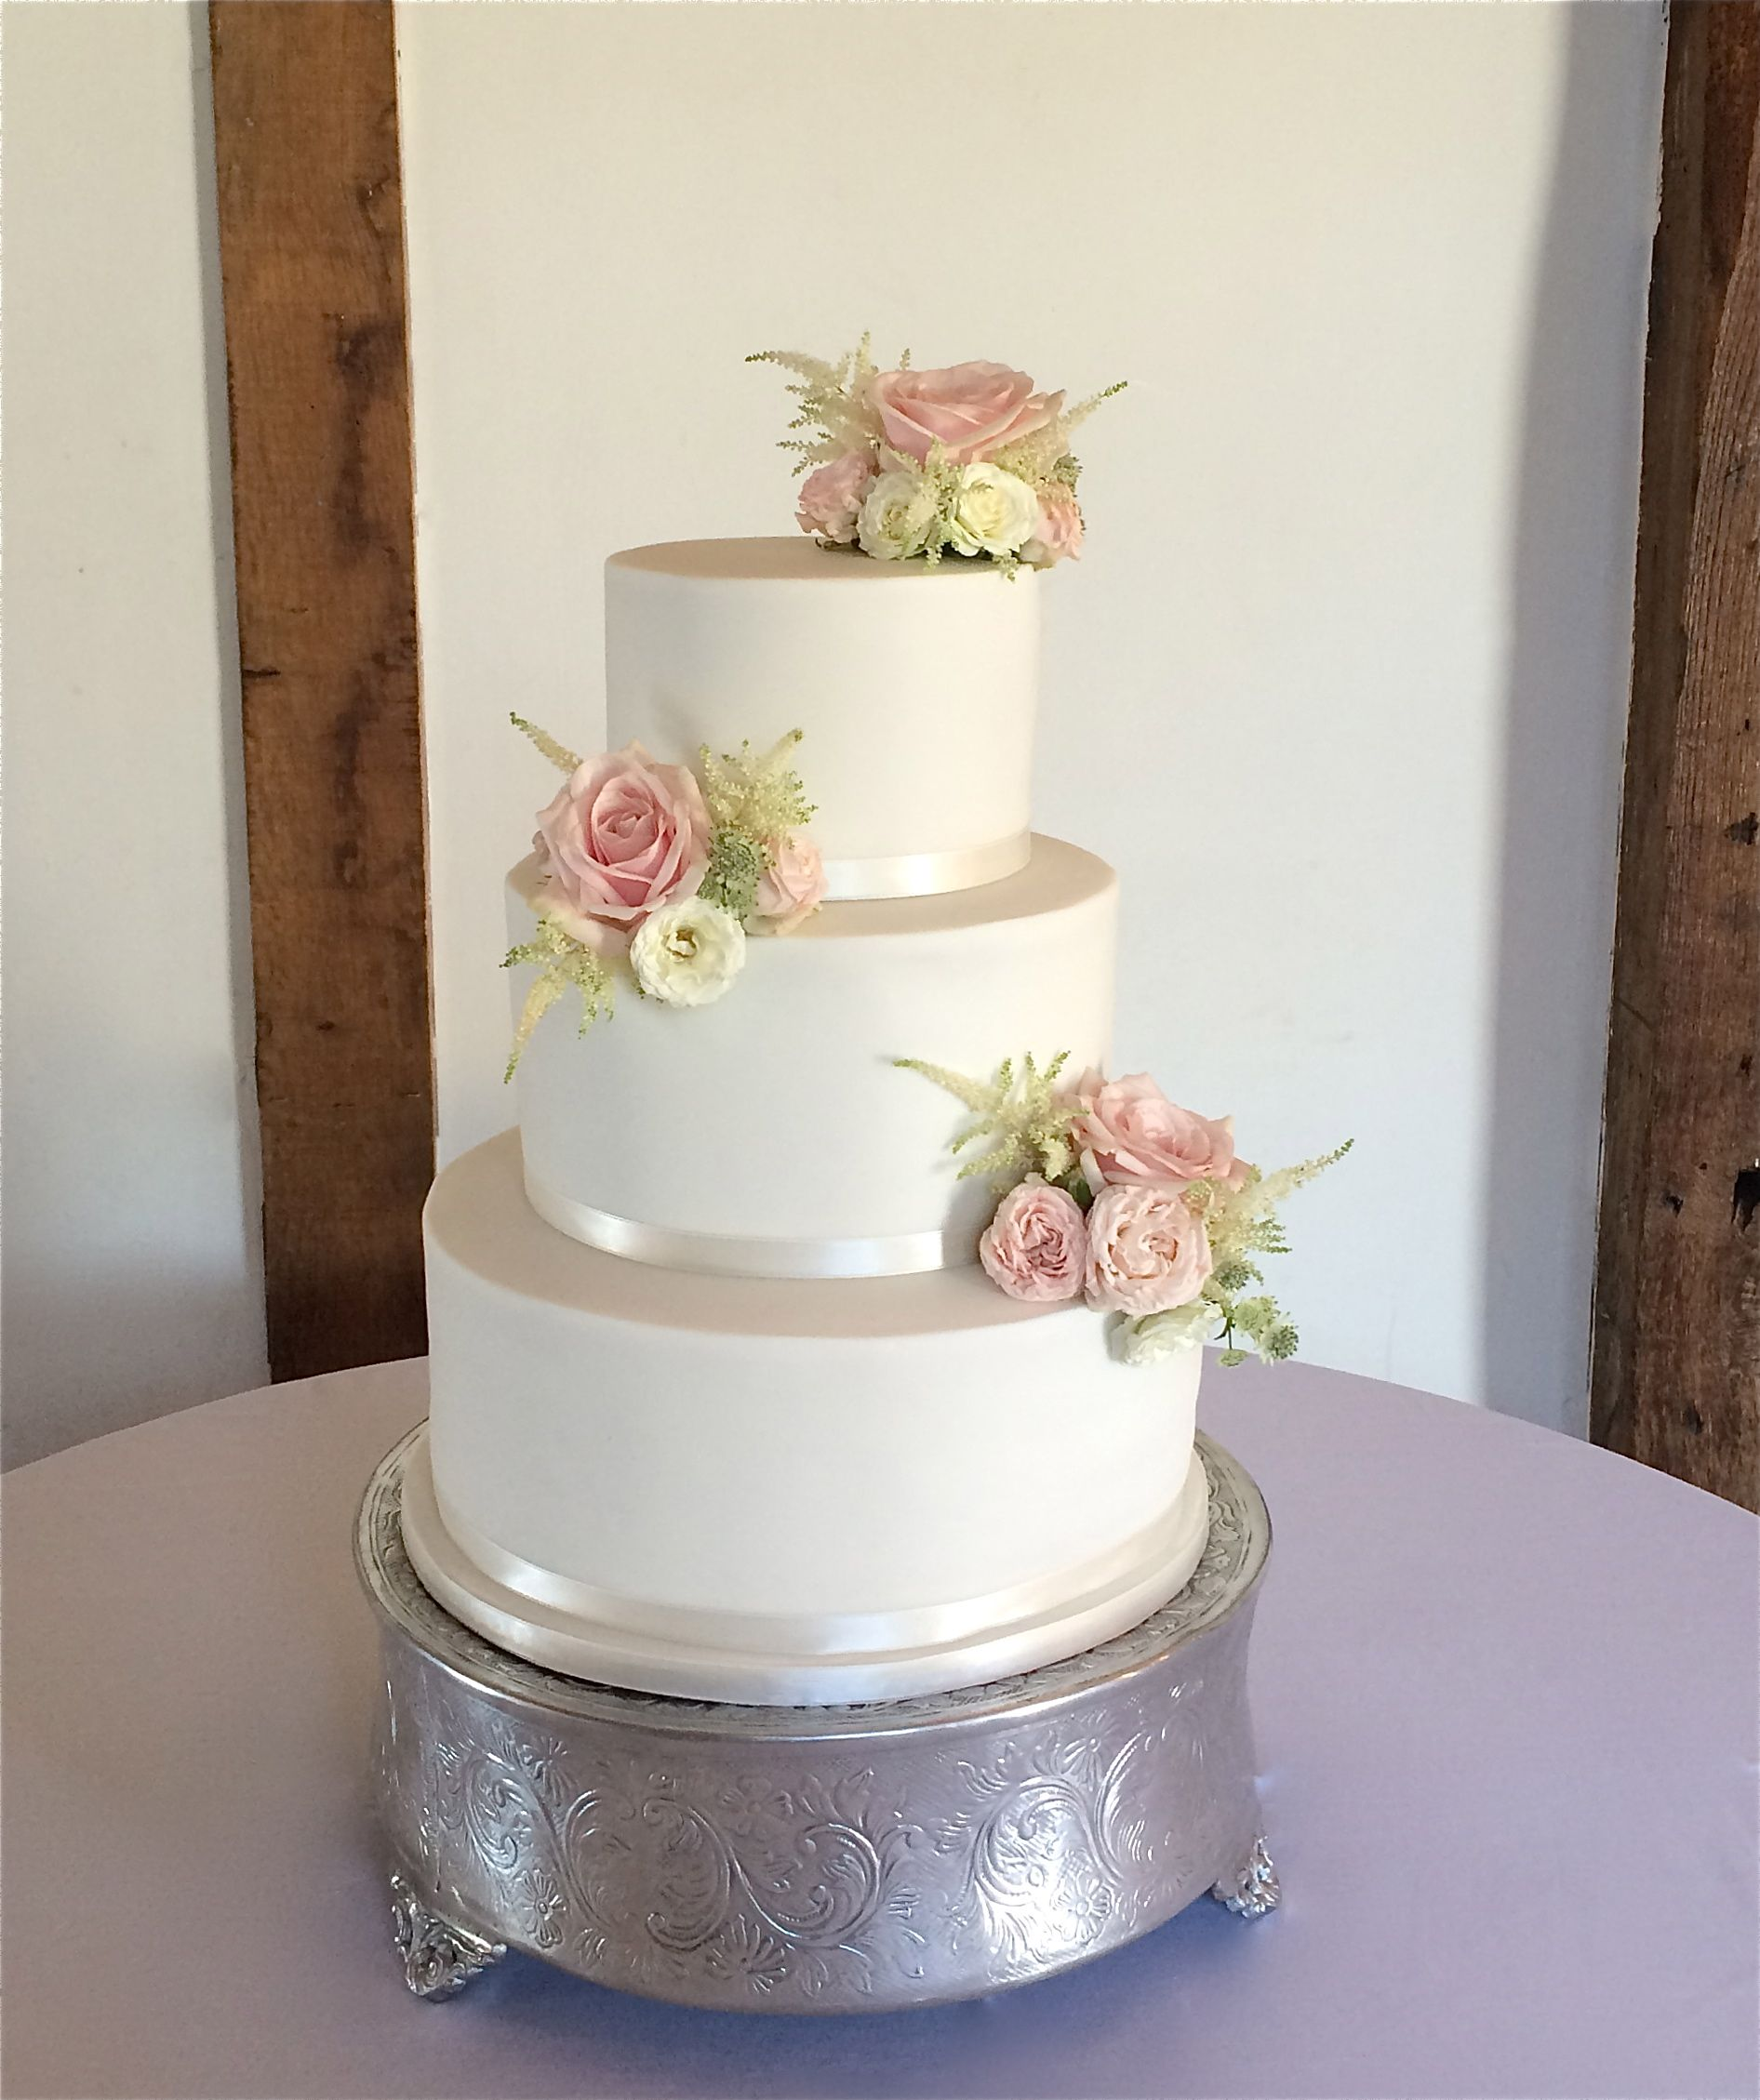 3 tier wedding cake with fresh flowers   Amazing cakes   Pinterest ...